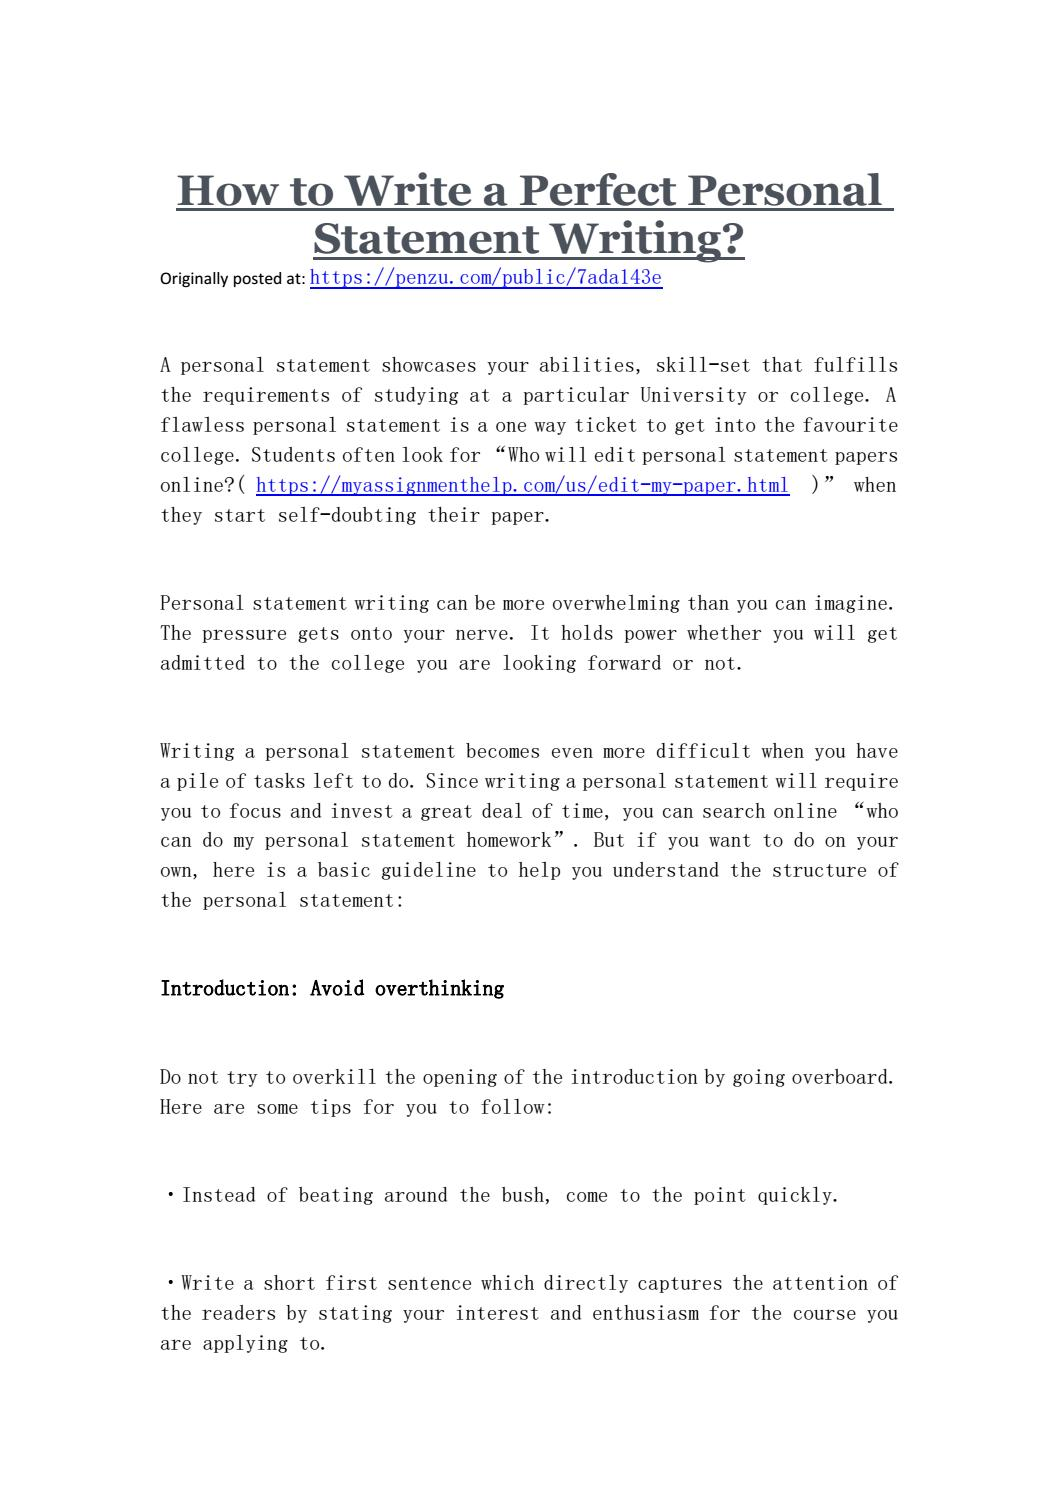 Data analysis in qualitative research dissertation